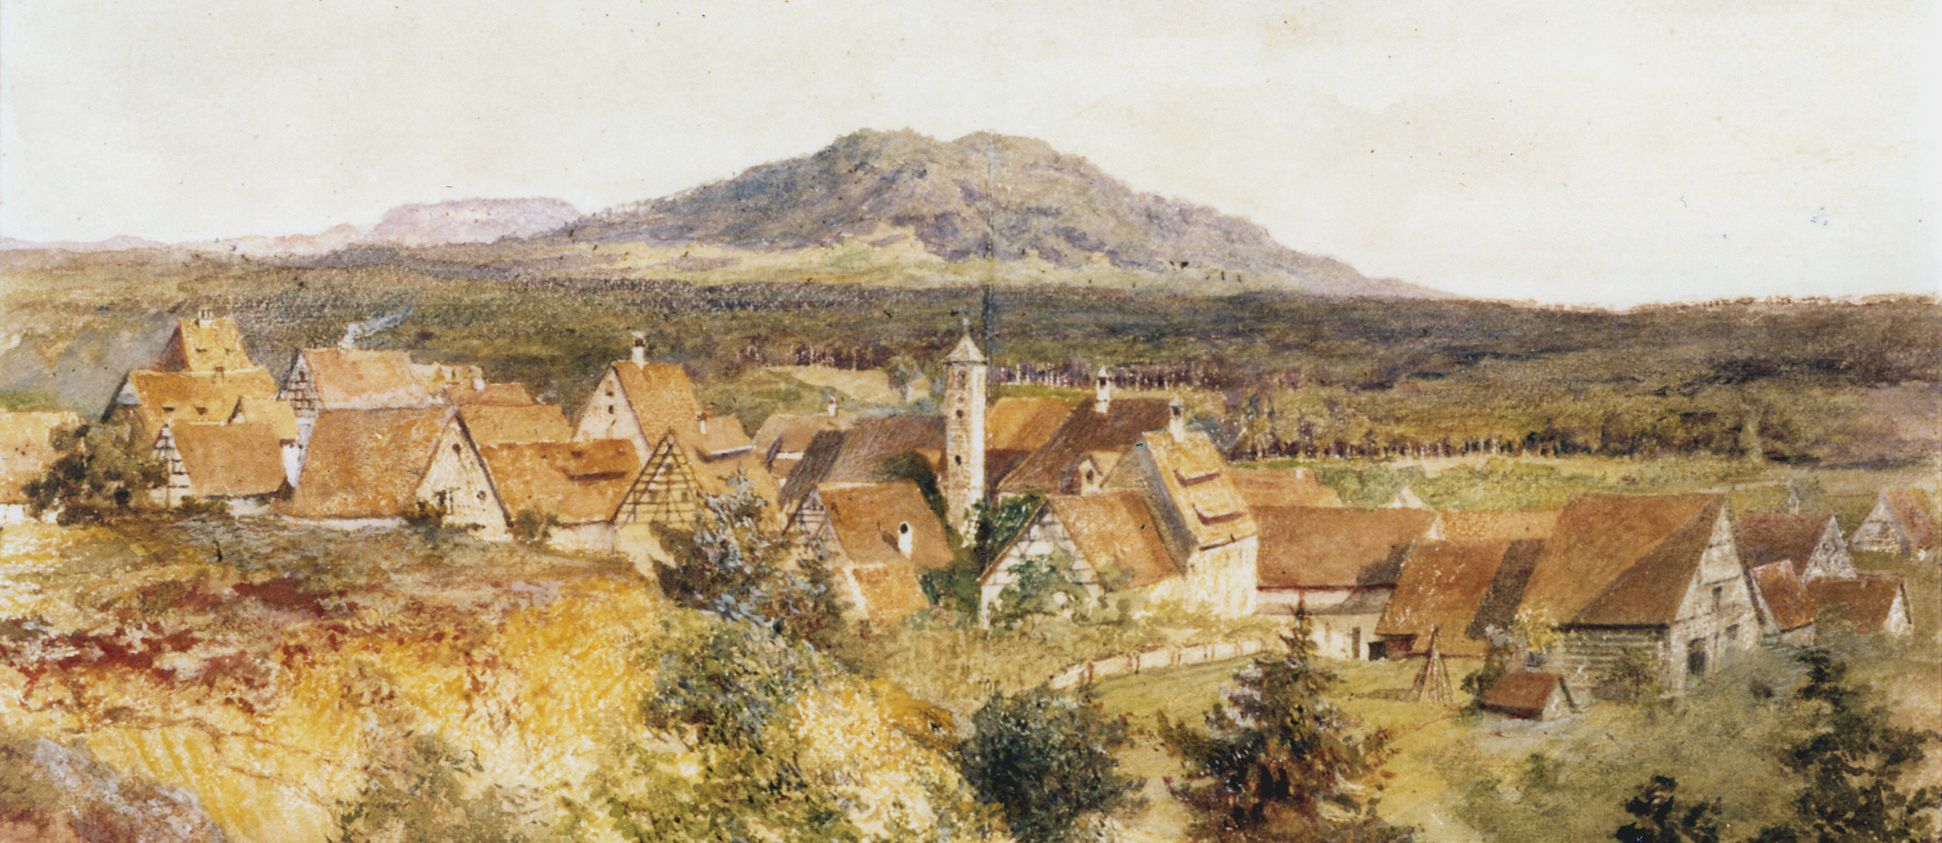 Rückersdorf mit Moritzberg obere Bildhälfte